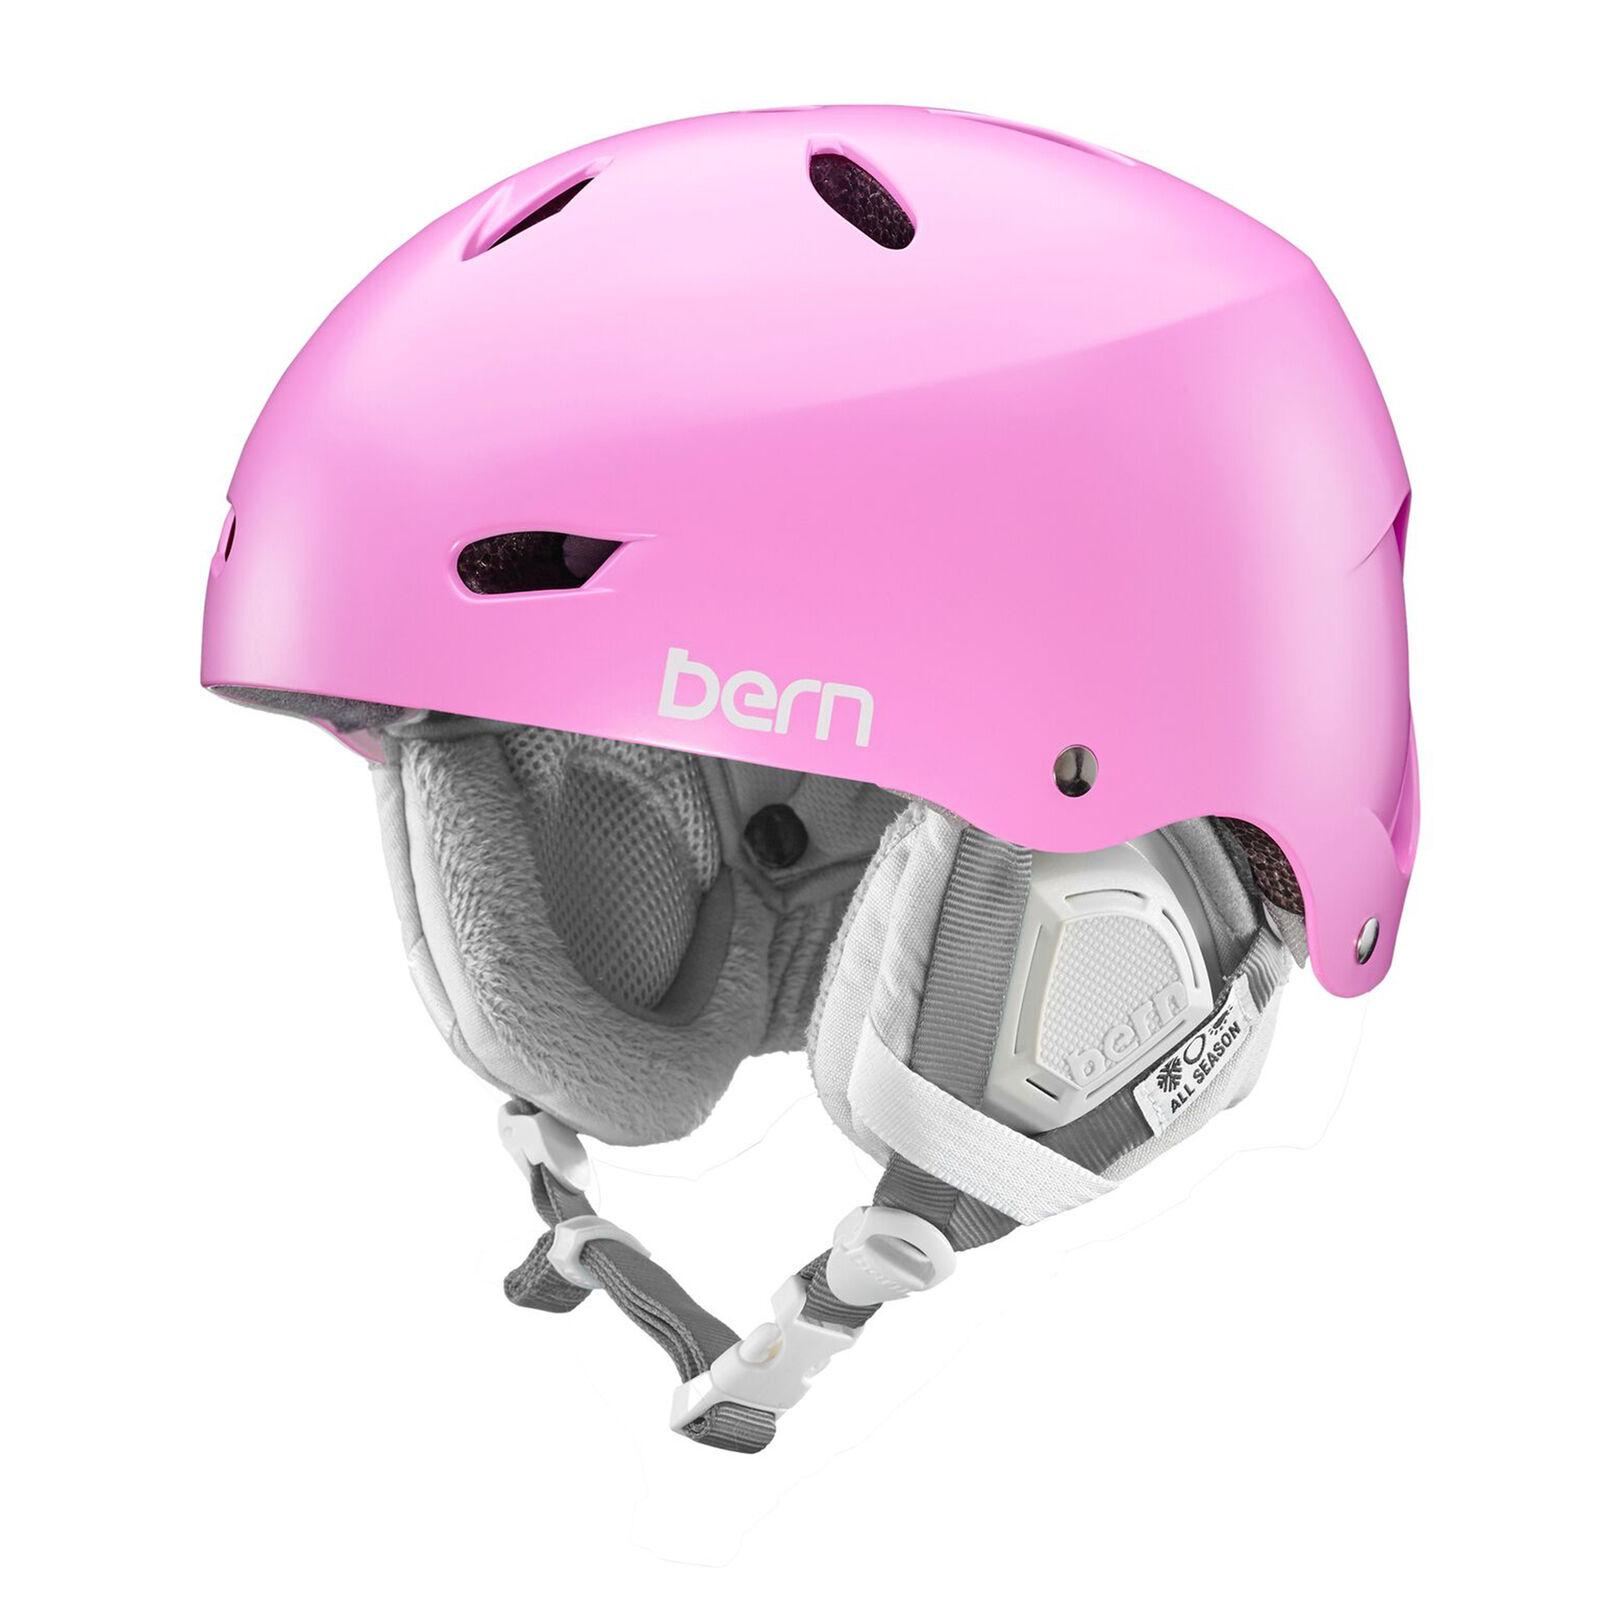 Bern Ladies Brighton Ski Snow Helmet Satin Hot Pink + Boa